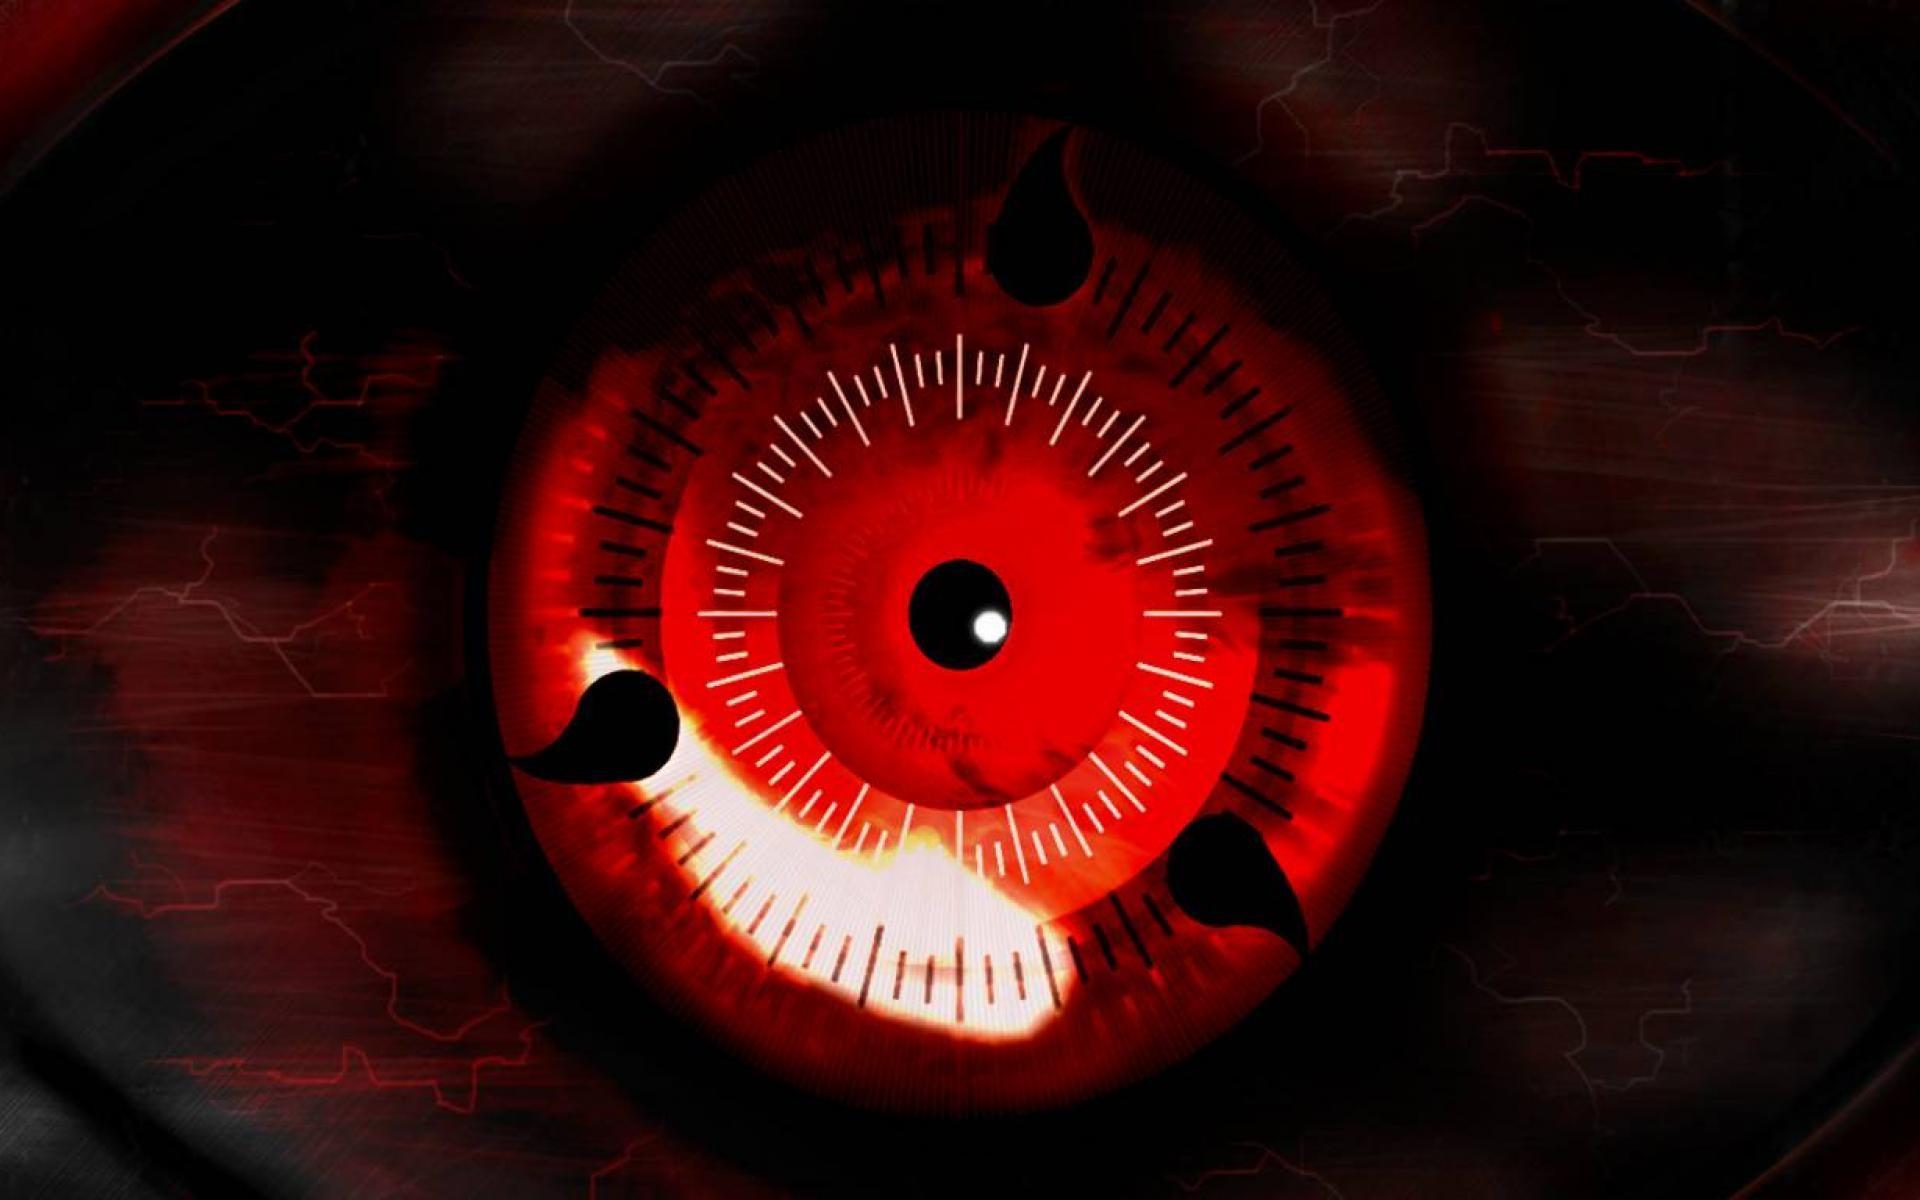 Uchiha Eyes Wallpaper (60+ Images